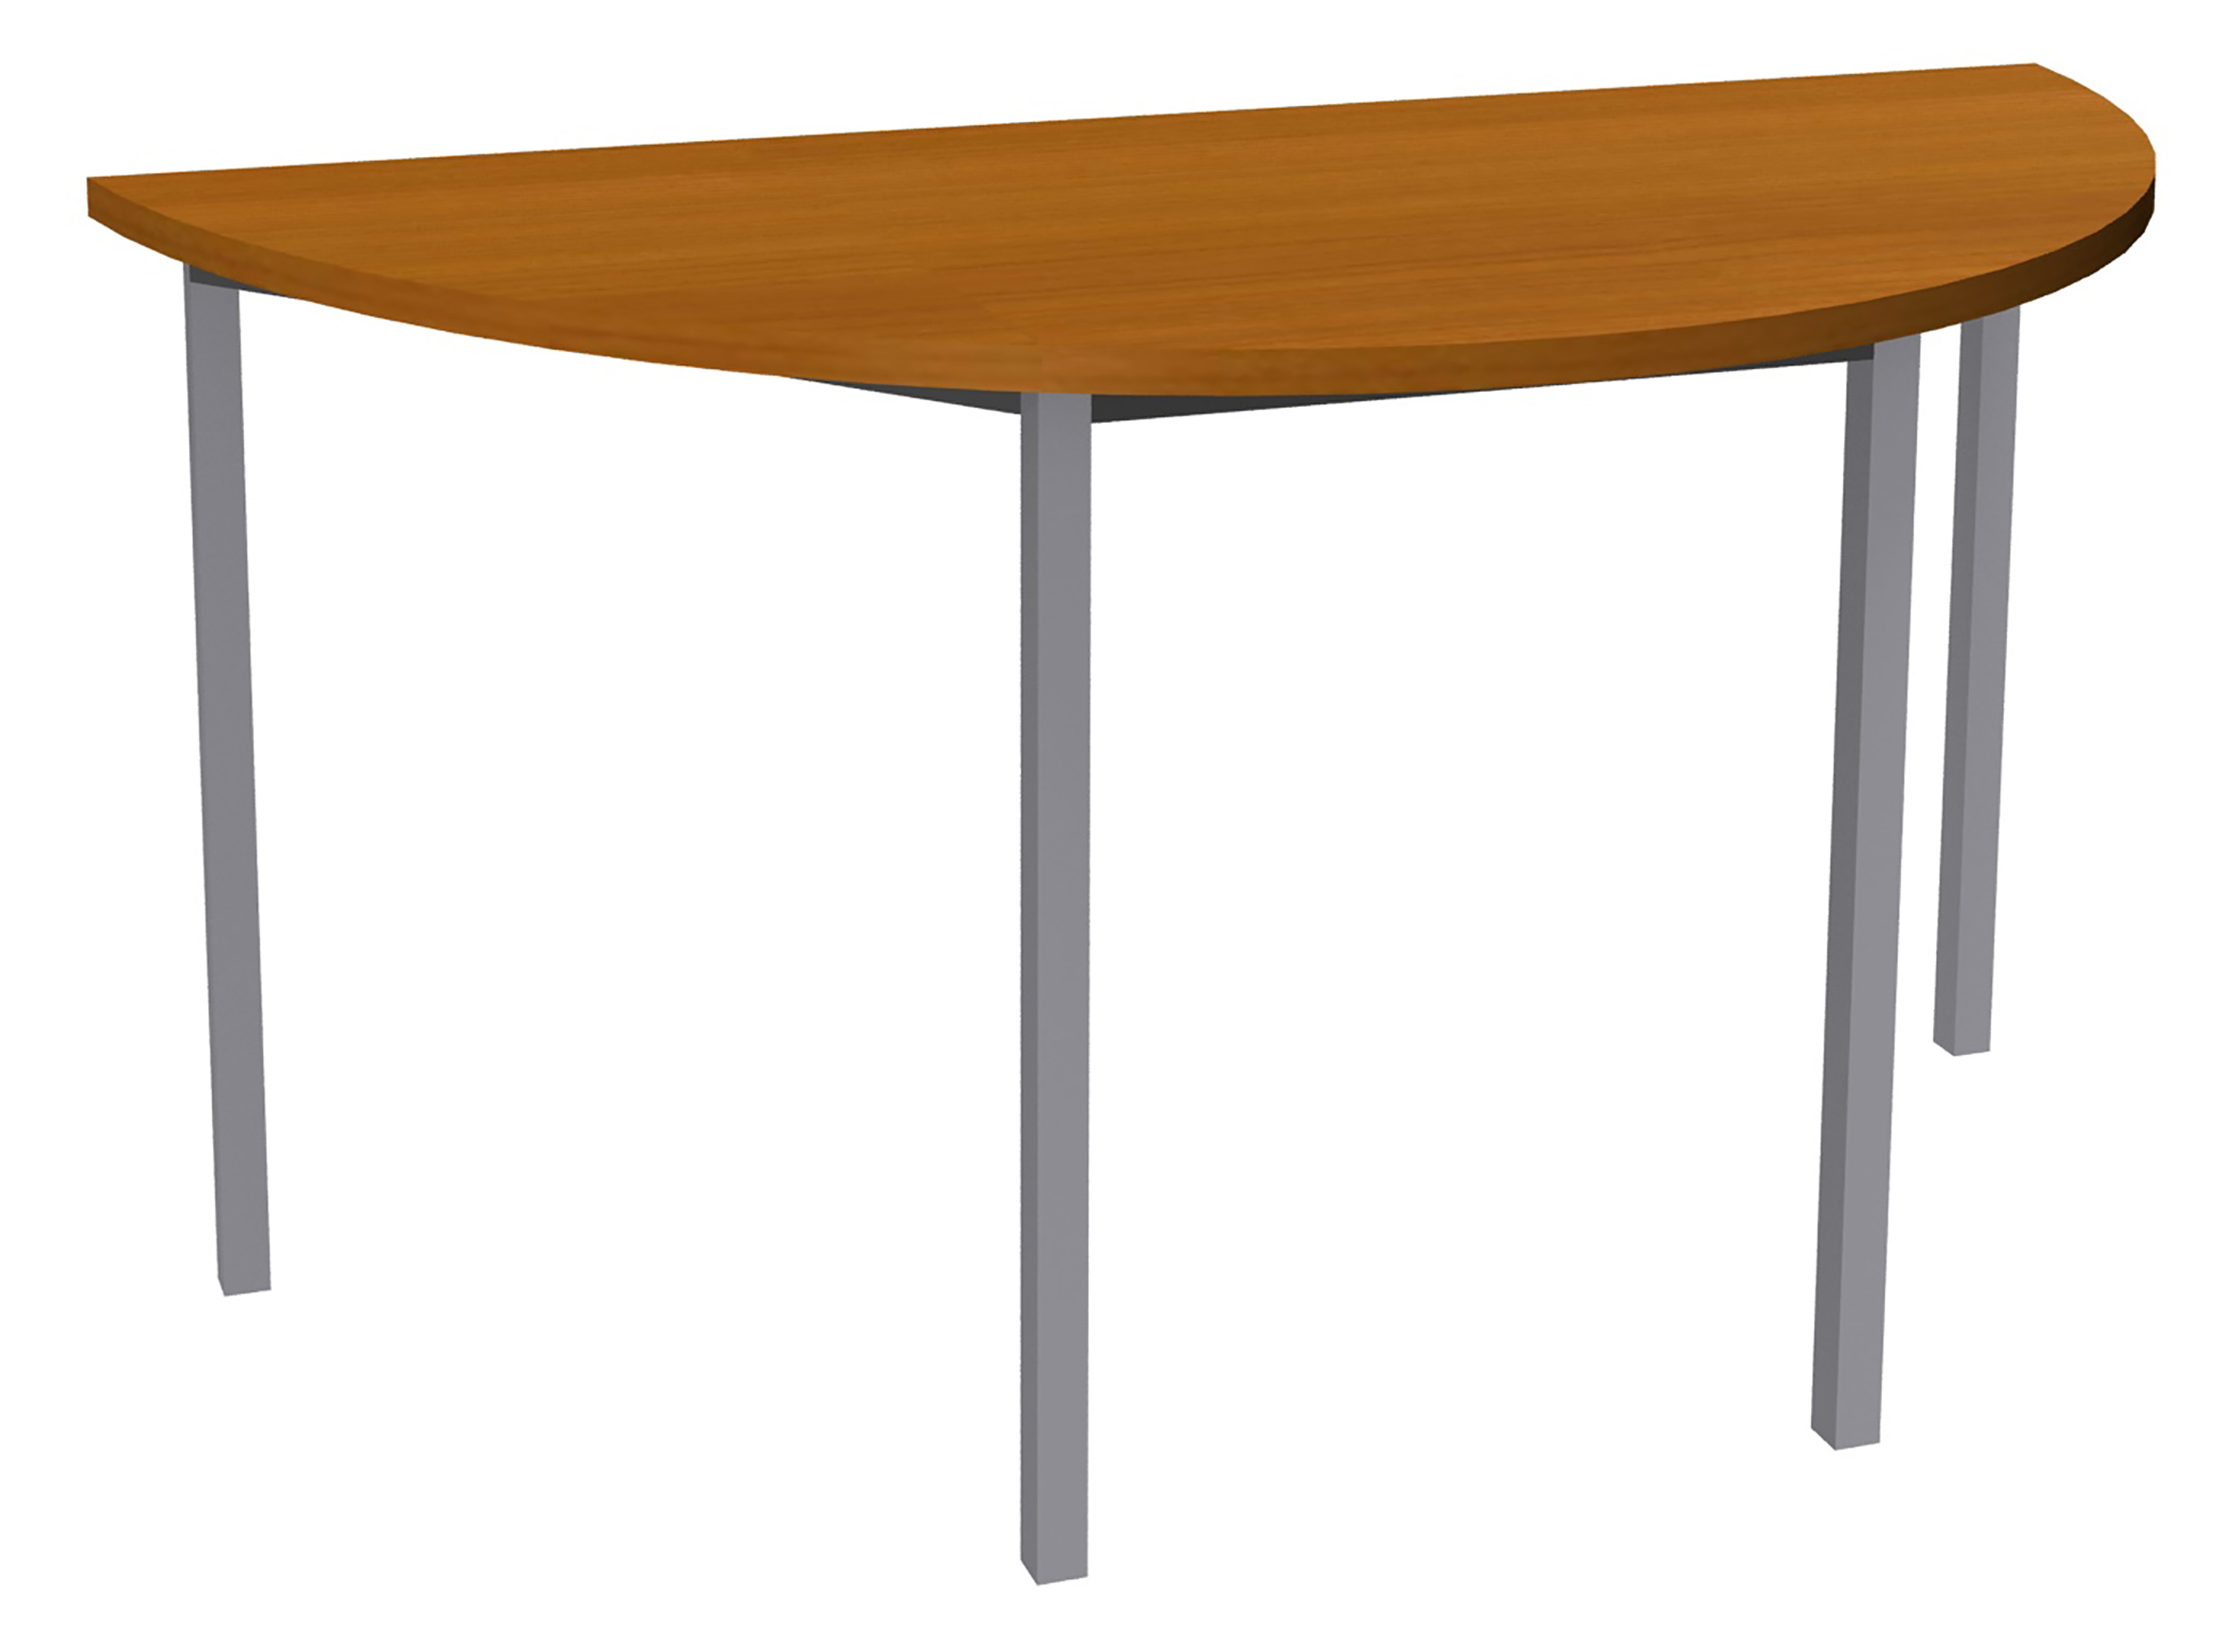 Table de réunion Demi-lune - 120 x 60 cm - Pieds aluminium - imitation merisier